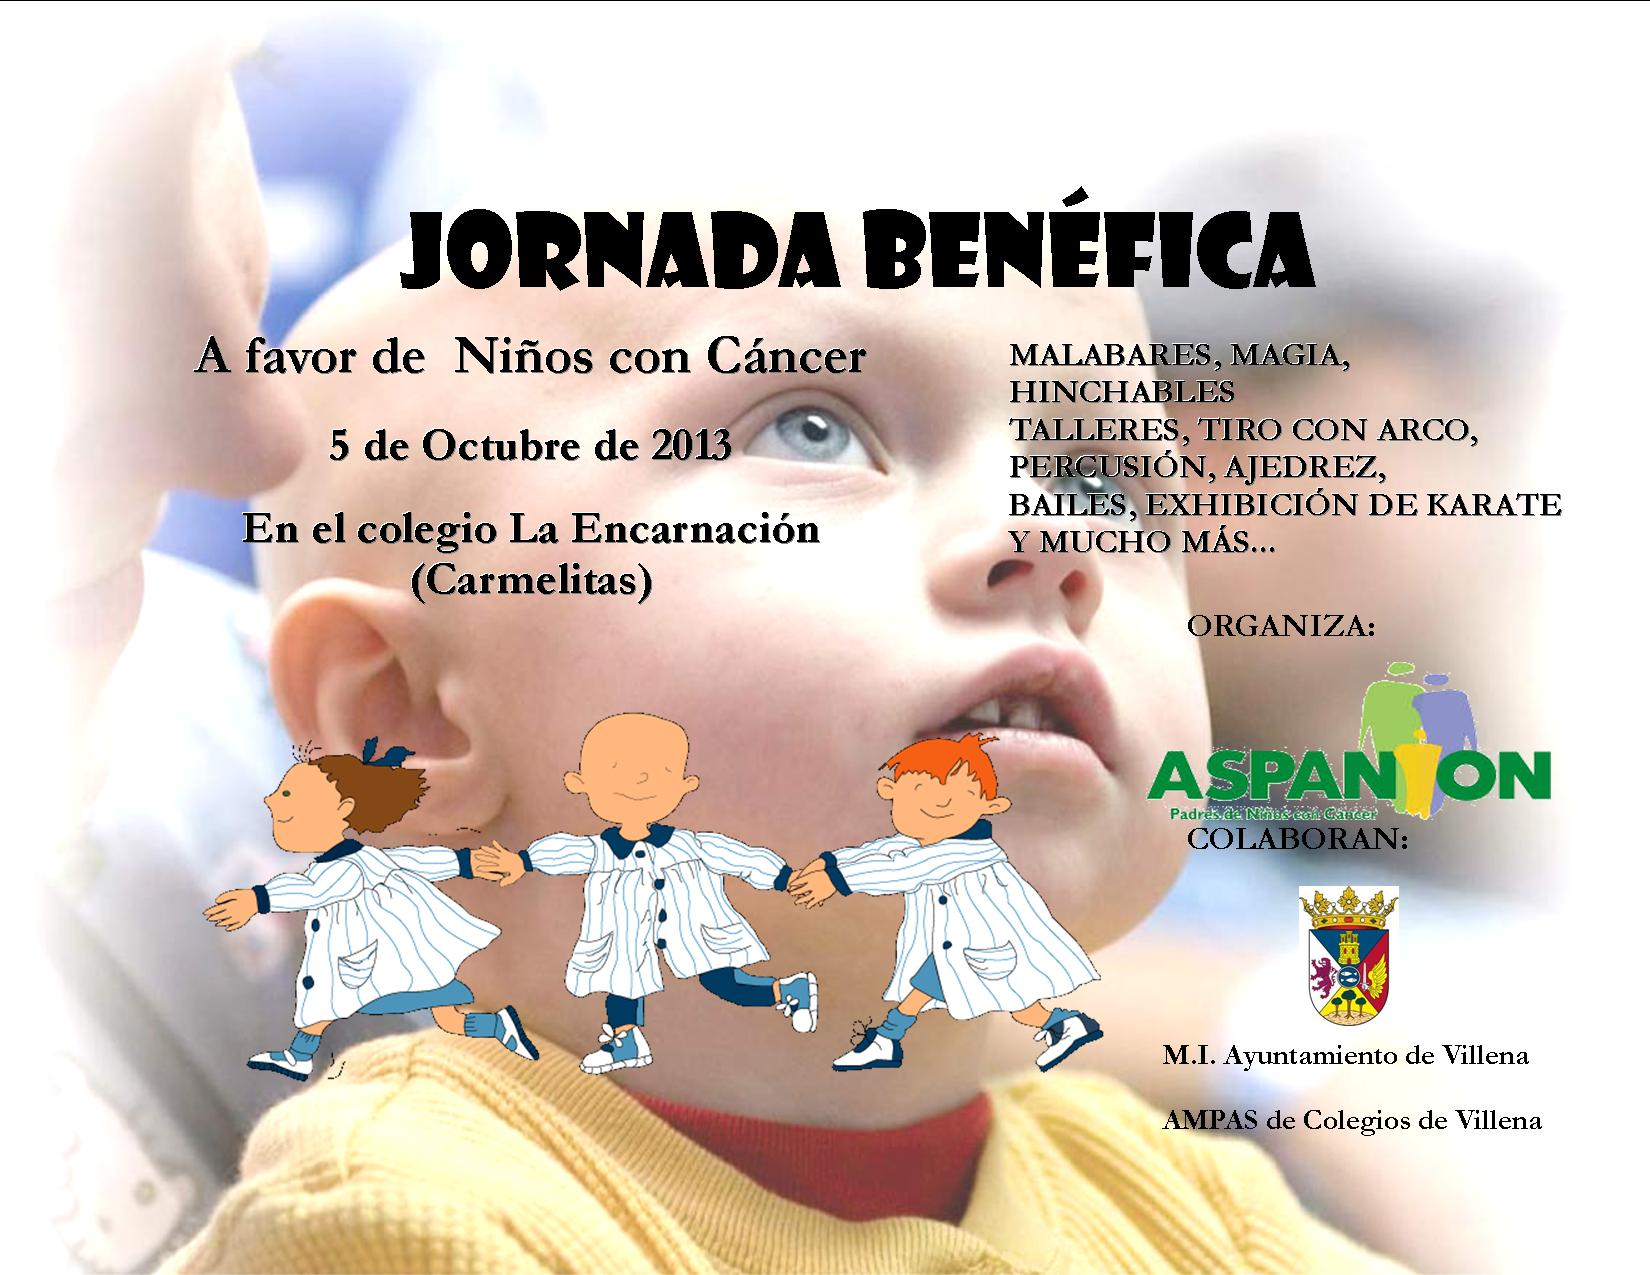 Jornada Benéfica. ASPANION